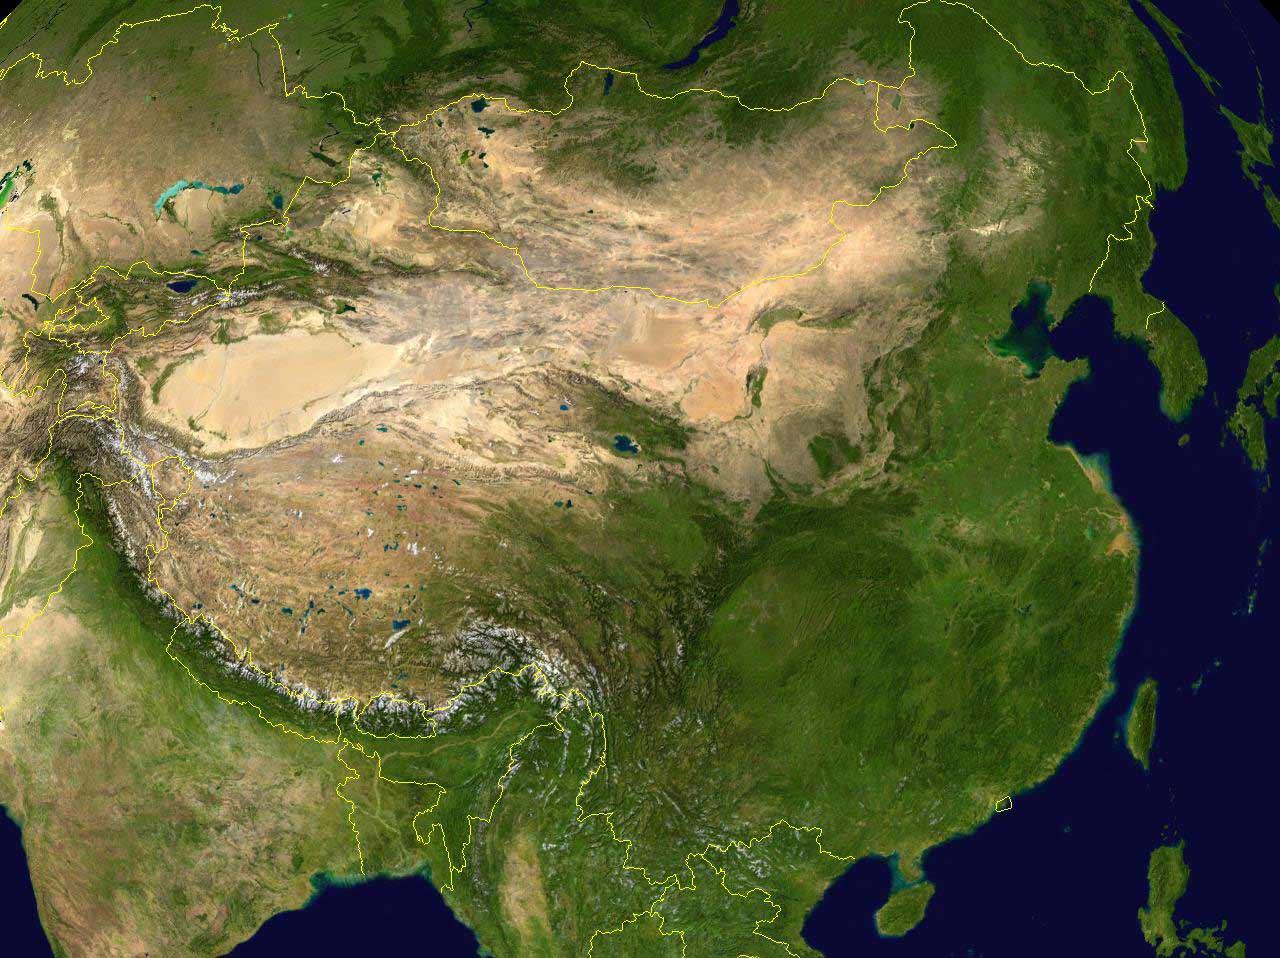 The China jigsaw